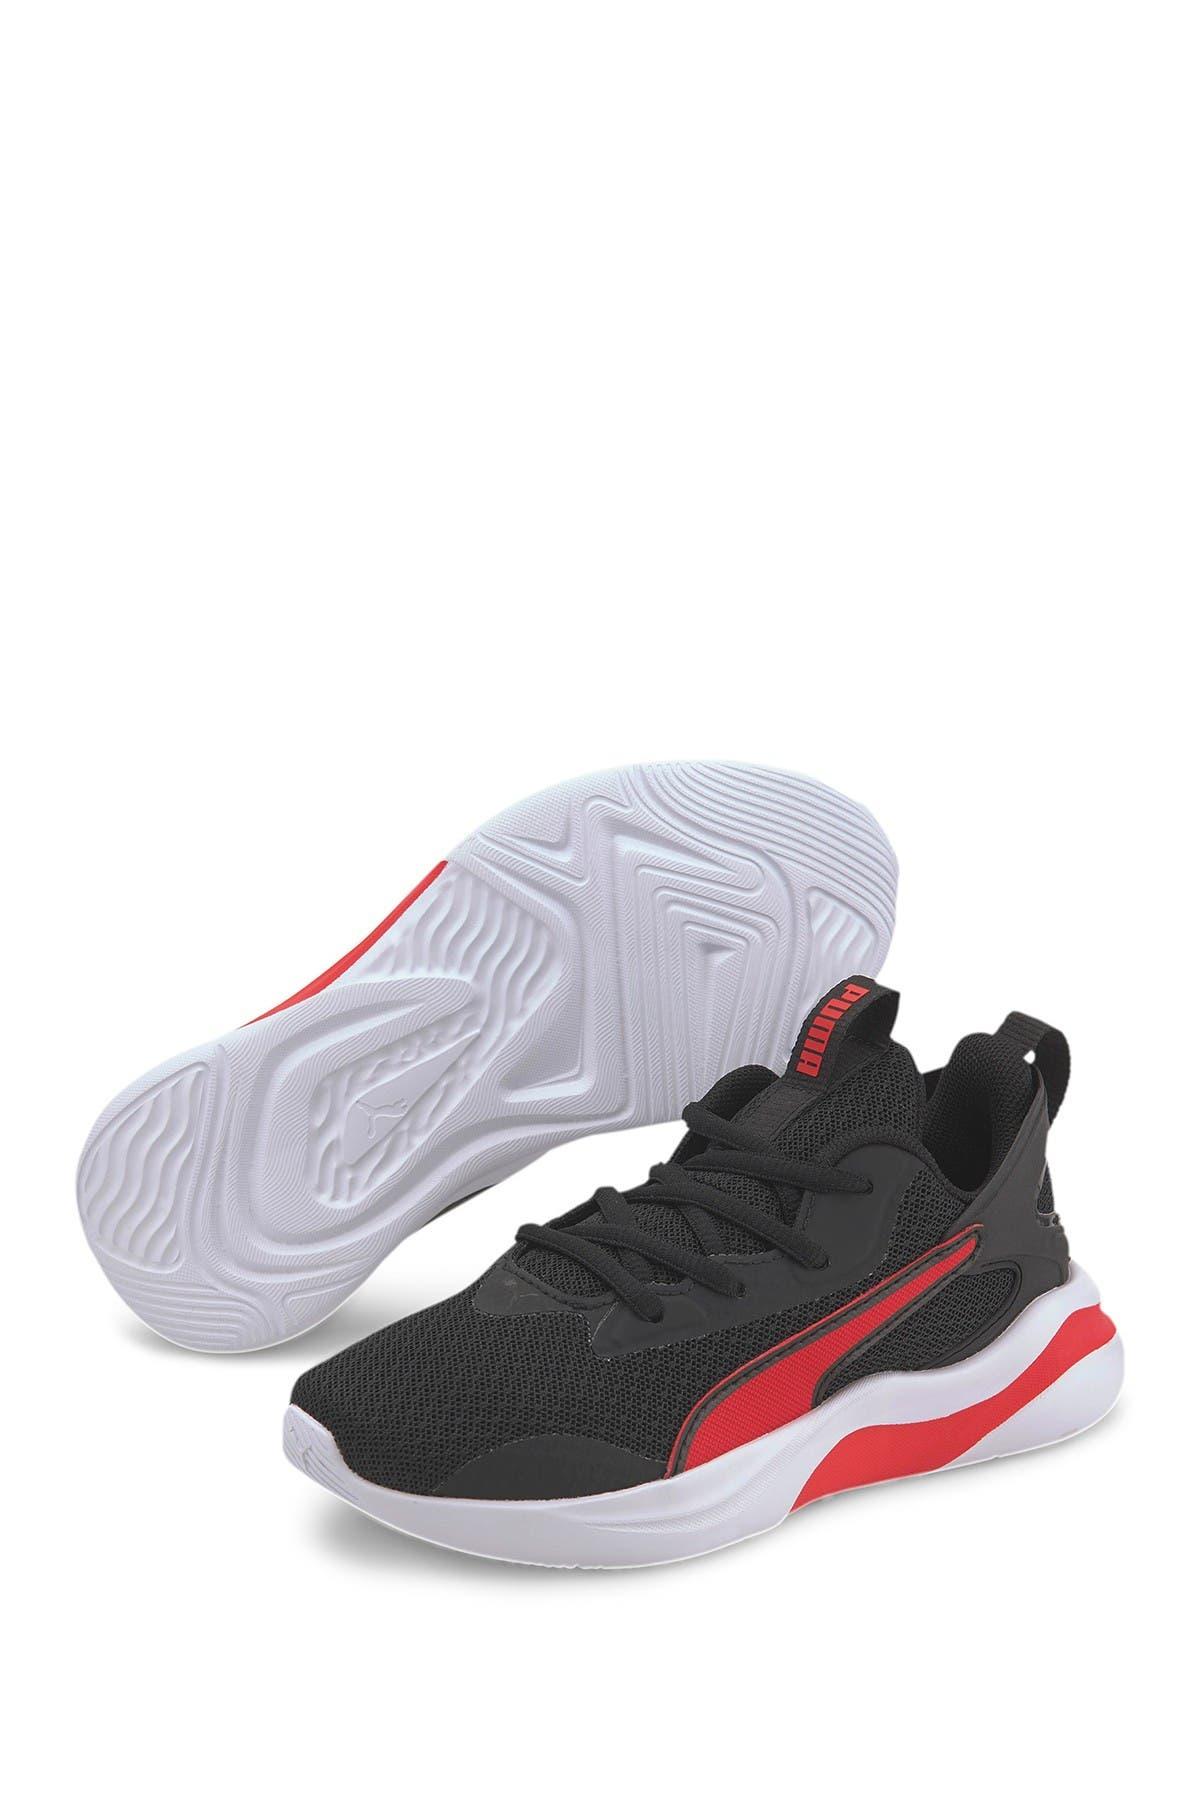 Image of PUMA RIFT AC Sneaker